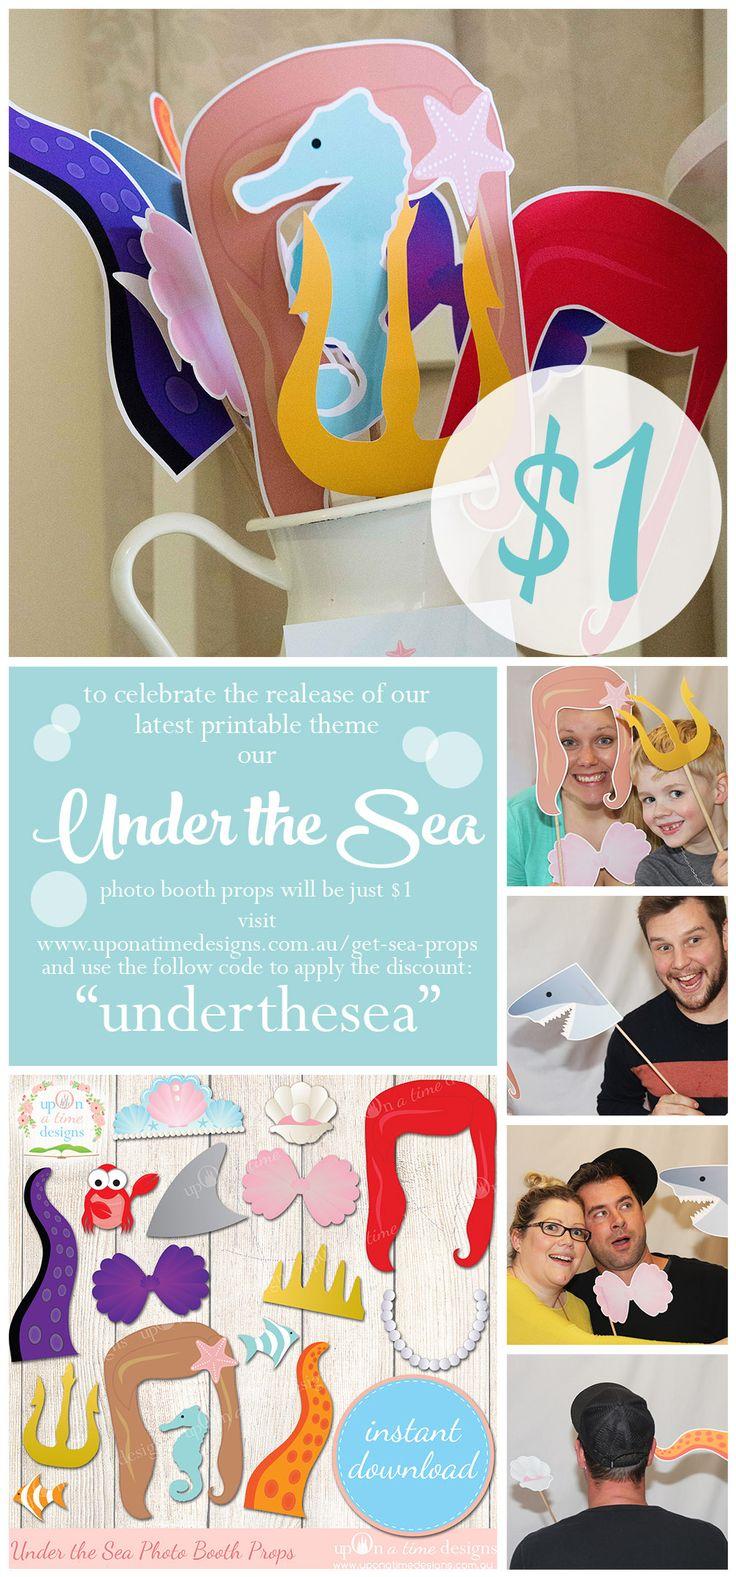 Under-the-Sea-Photobooth-Props-1-Pinterest-Display.jpg 1,008×2,160 pixeles